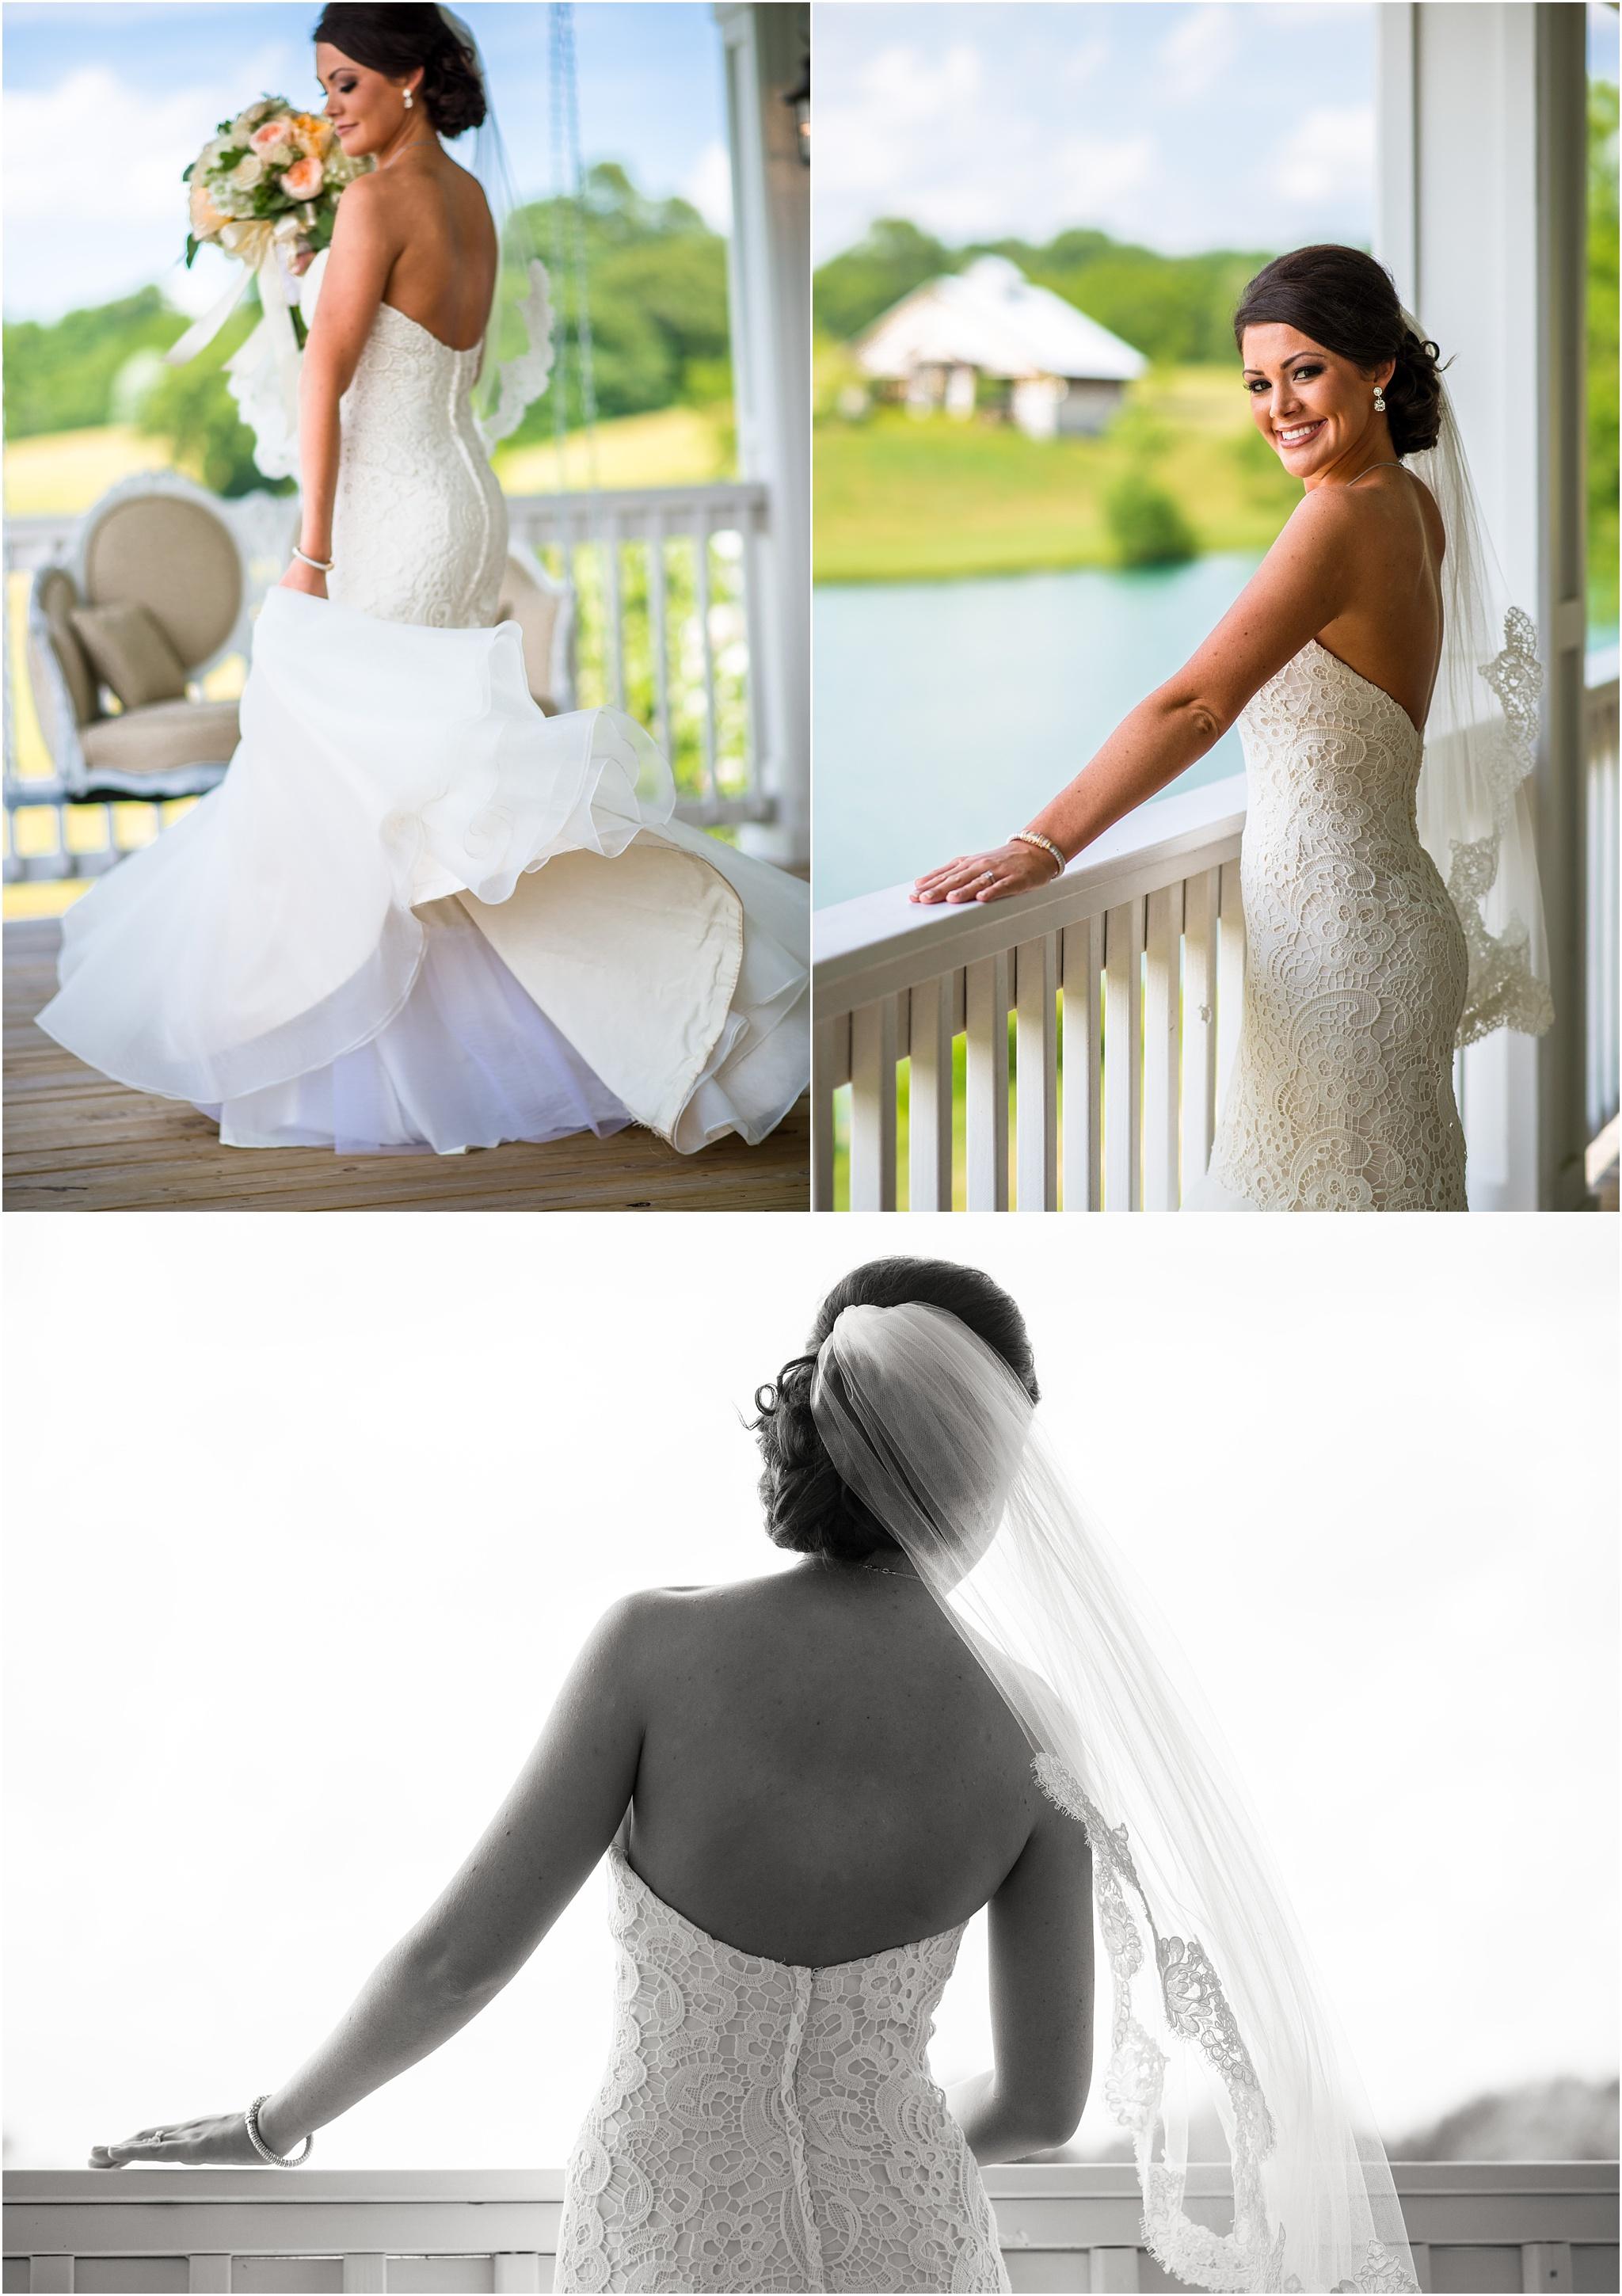 Greg Smit Photography Nashville wedding photographer Mint Springs Farm 5